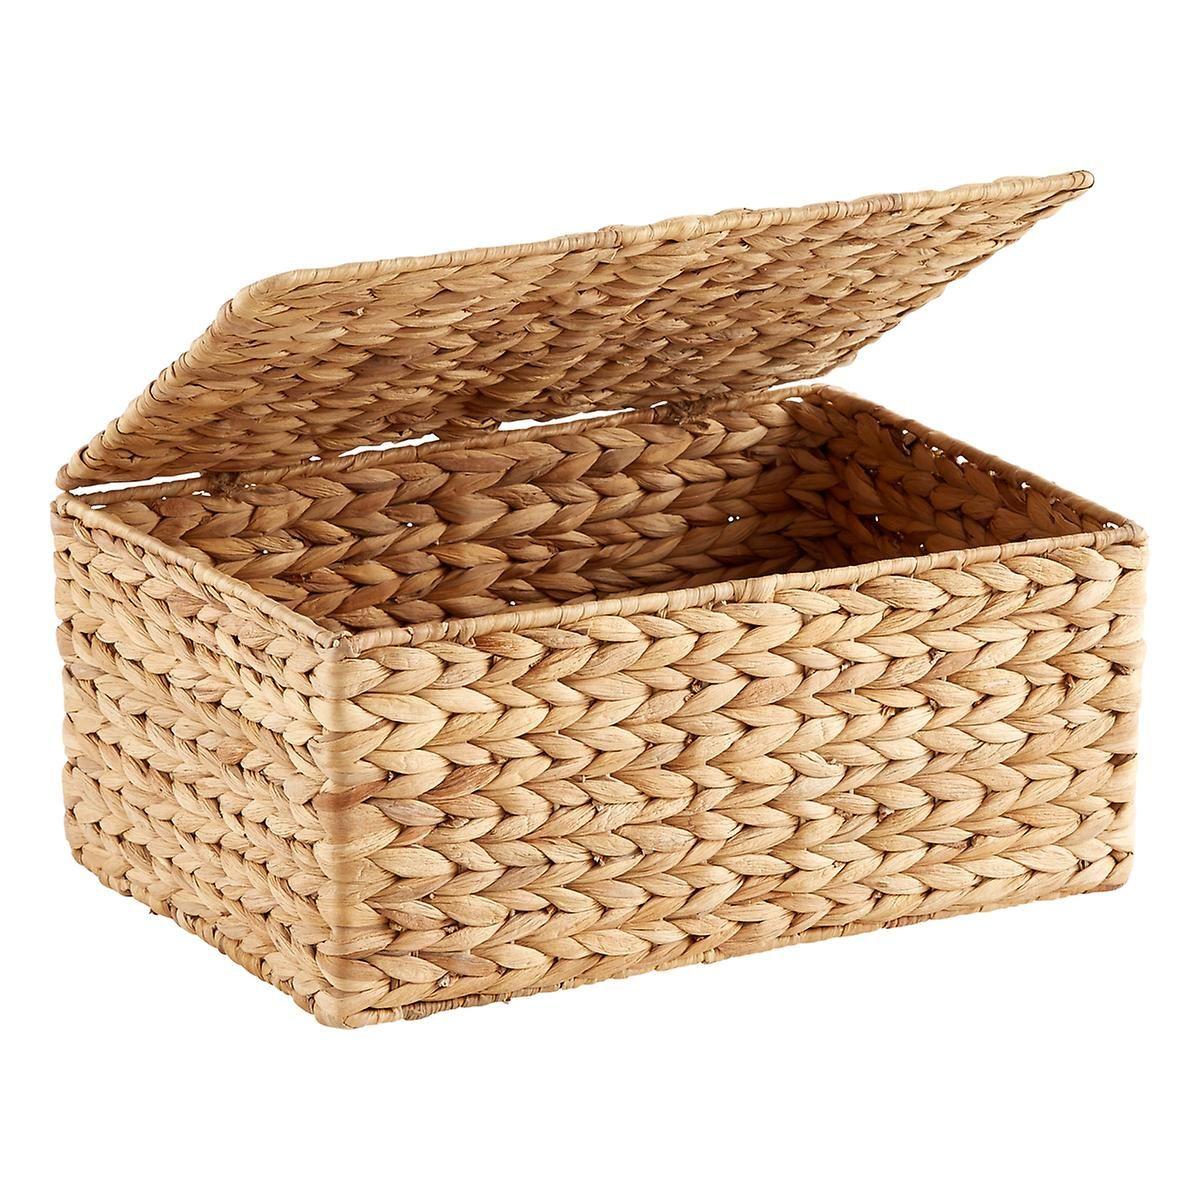 Small Water Hyacinth Storage Box With Hinged Lid Small Storage Boxes Storage Boxes With Lids Small Storage